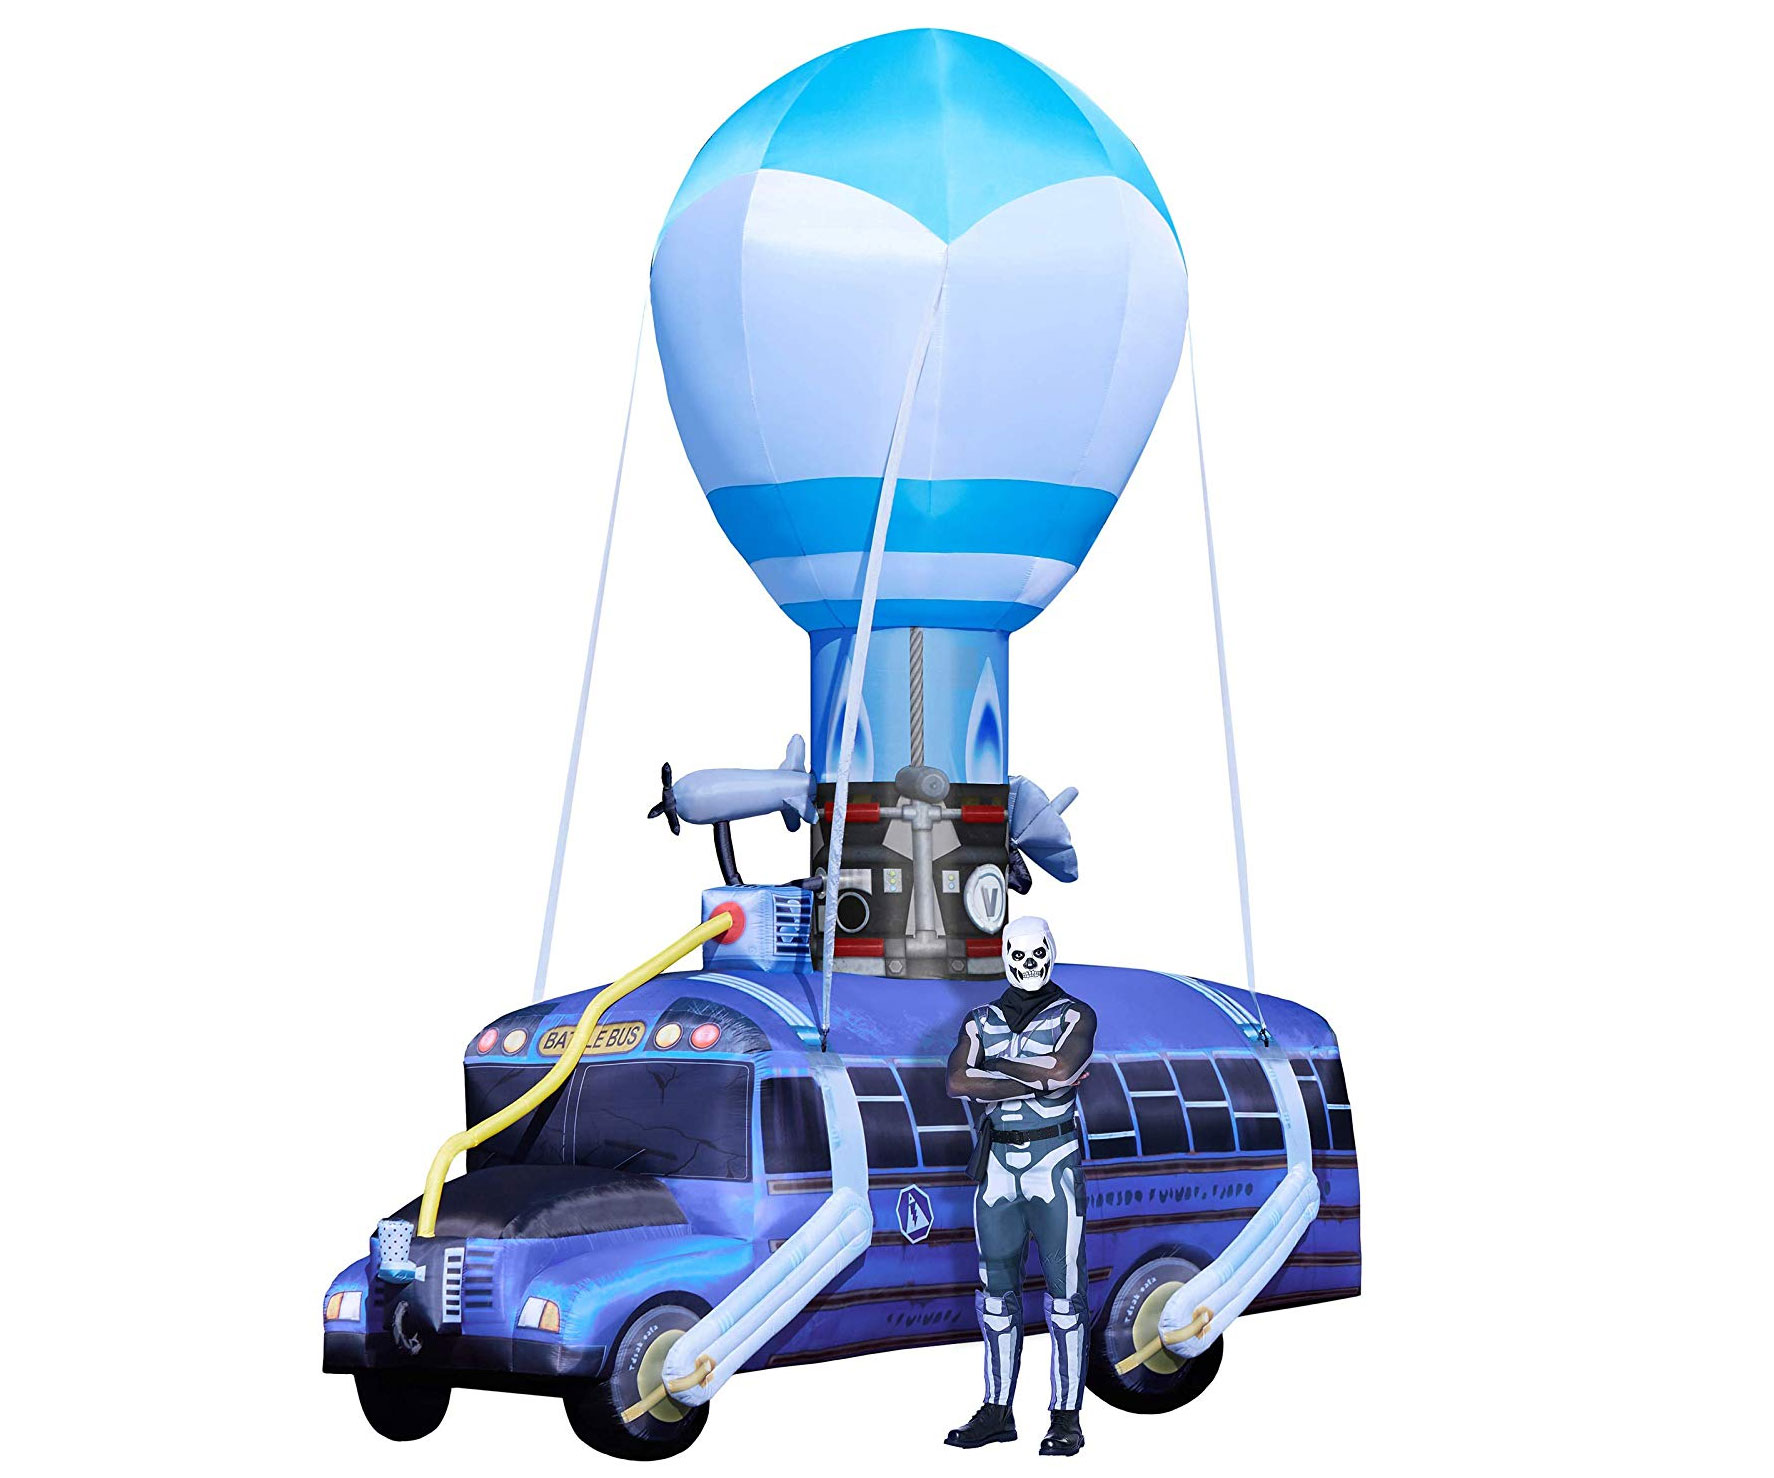 Inflatable Fortnite Battle Bus